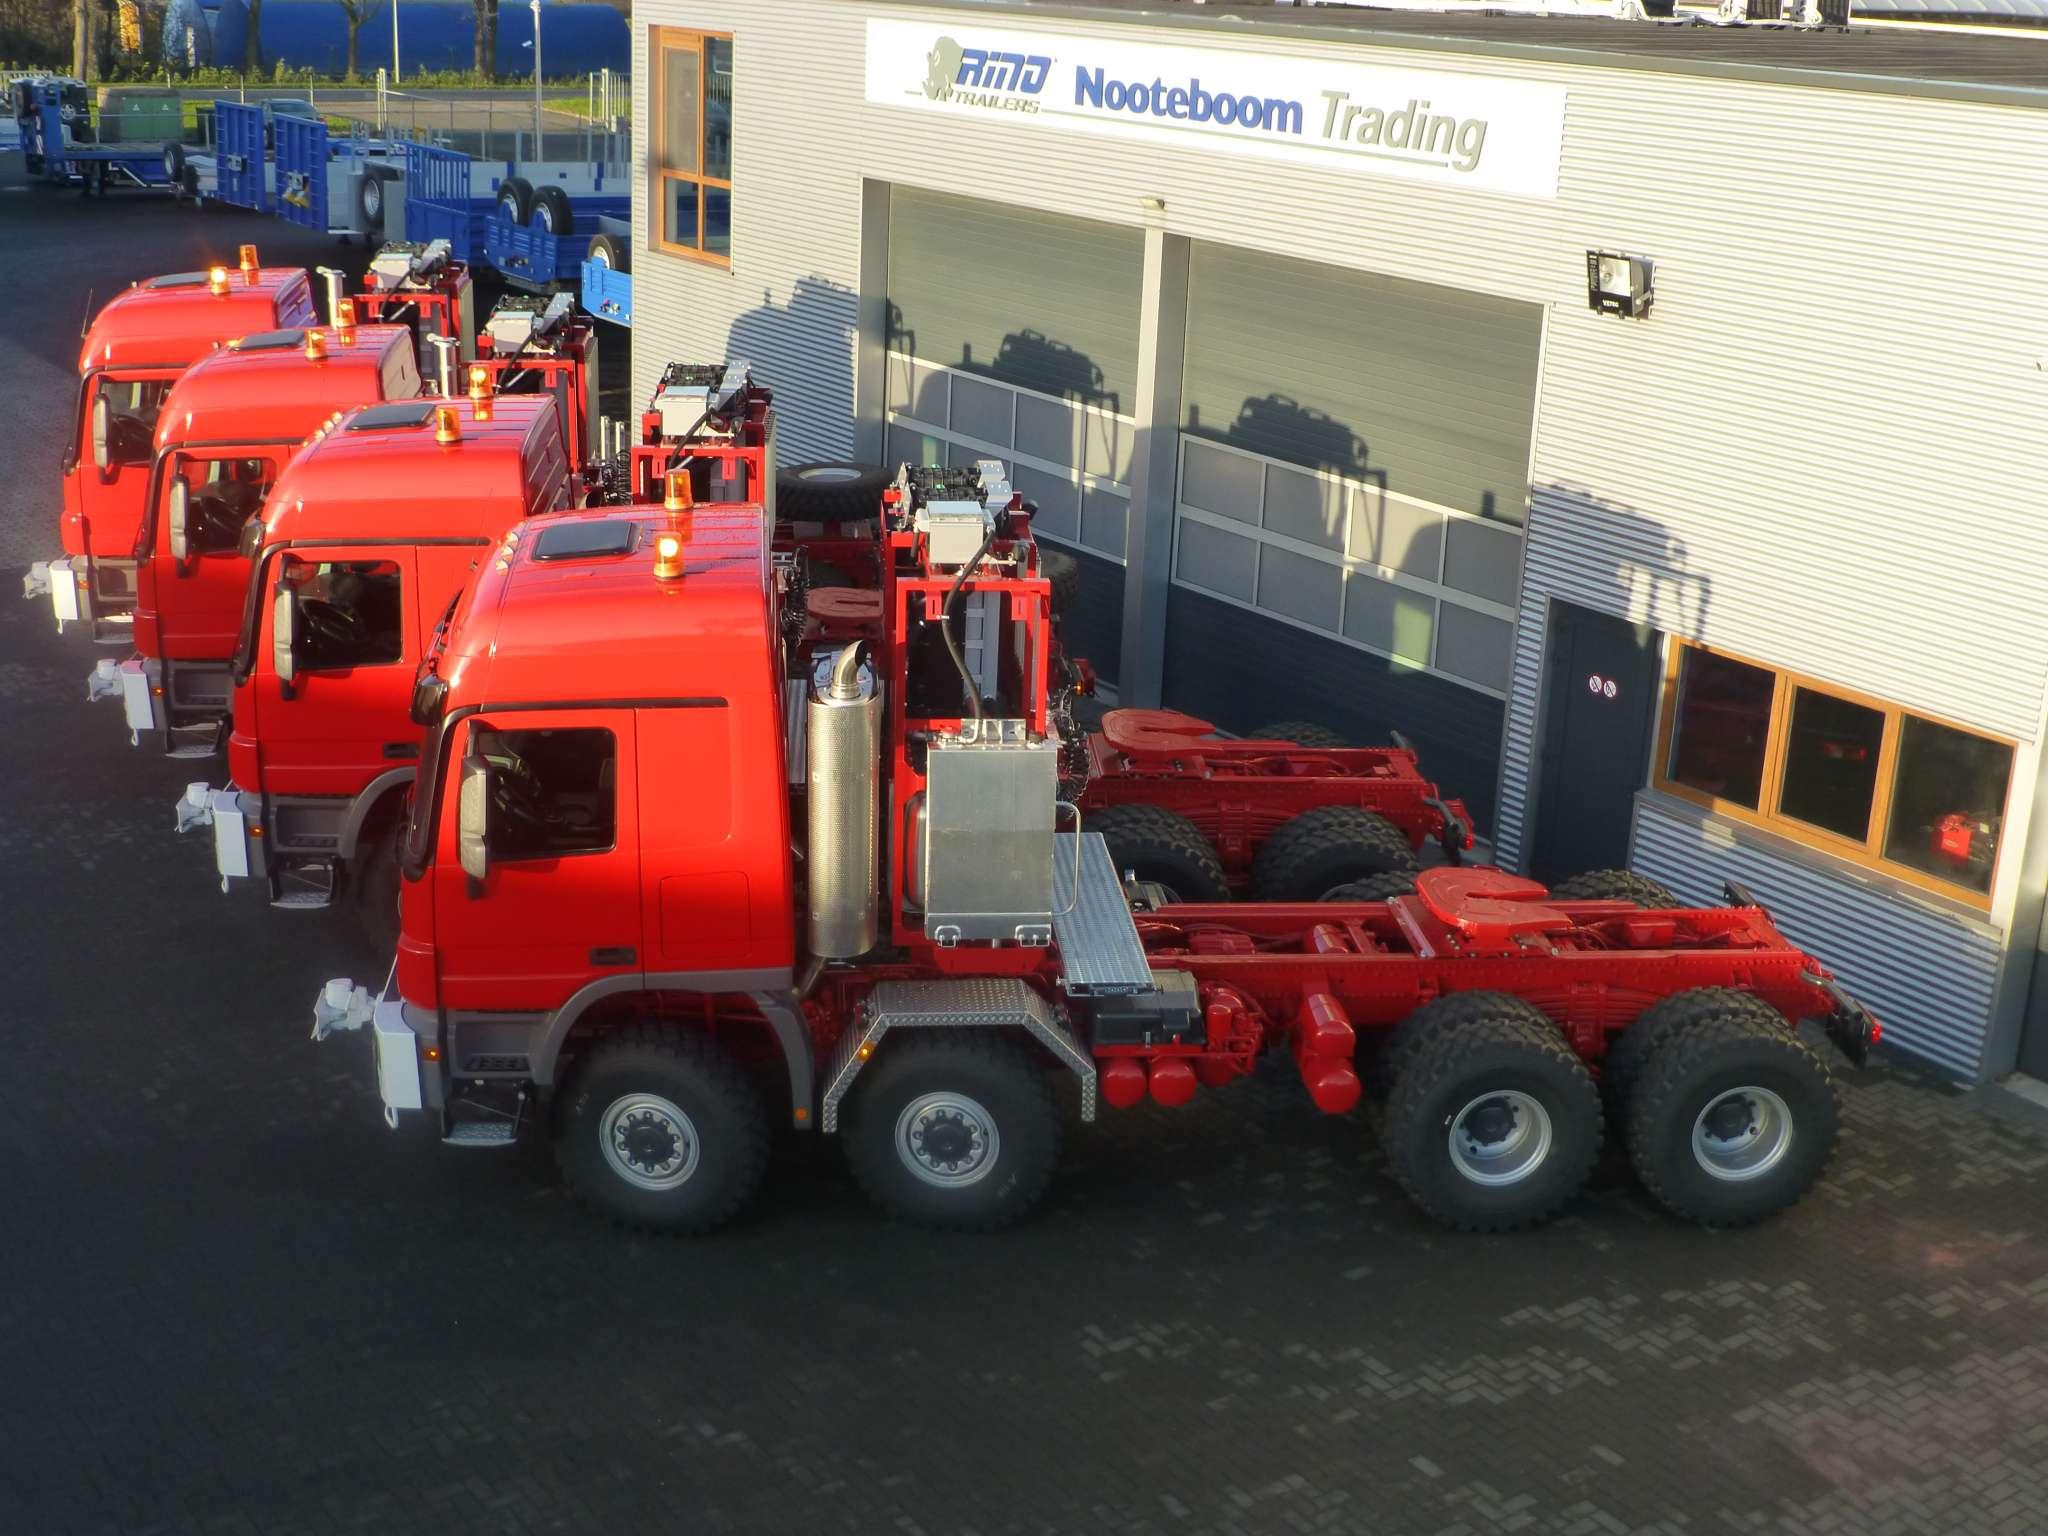 Mercedes Benz zwaar transport truck 350 ton plus 8x8 push and pull, direct beschikbaar